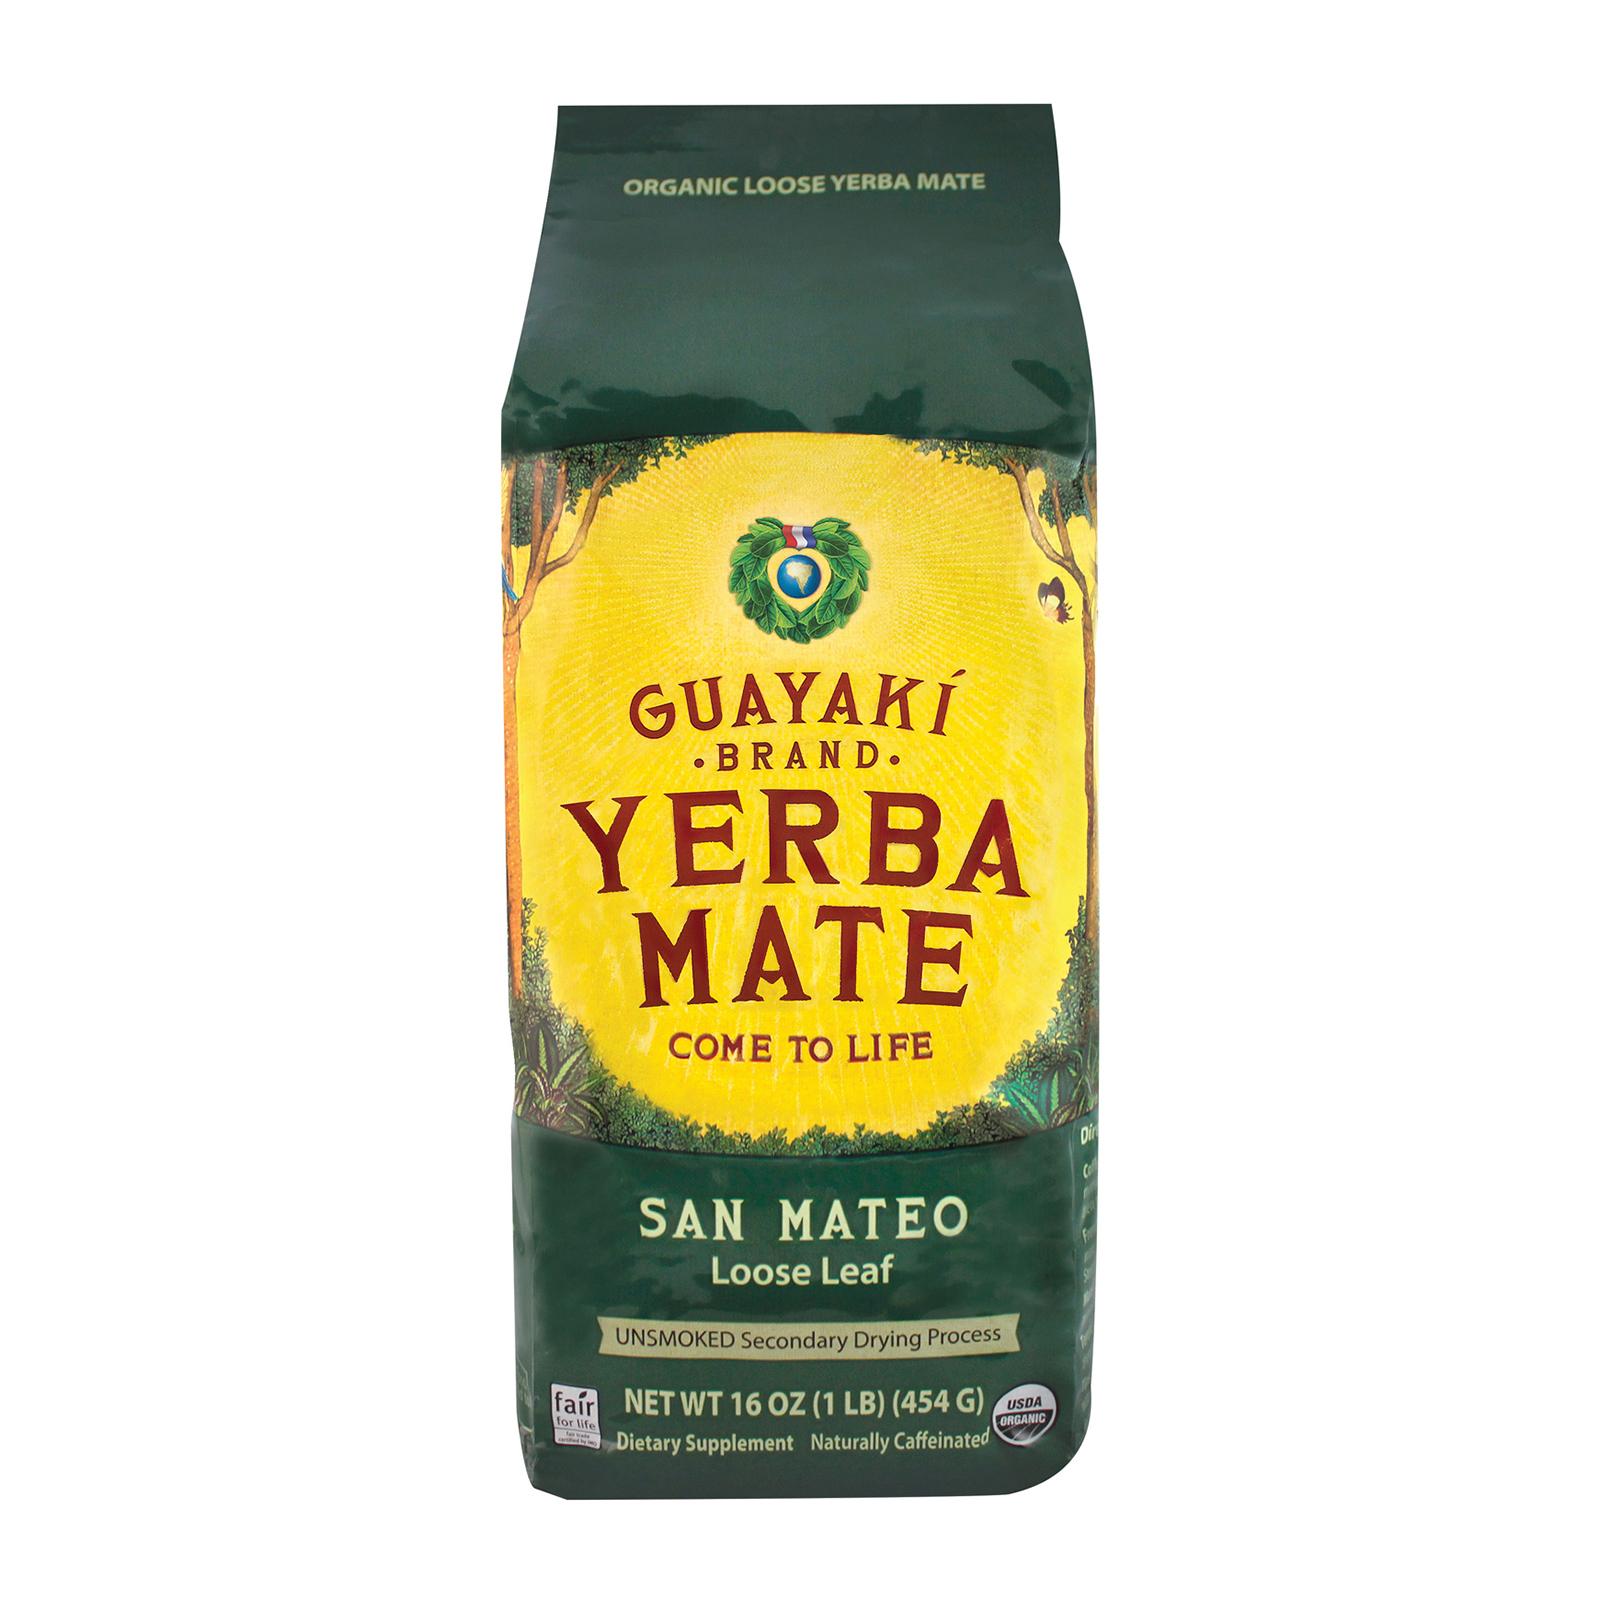 Guayaki Yerba Mate - San Mateo Air Dried - Loose Leaf - Case of 6 - 16 oz.